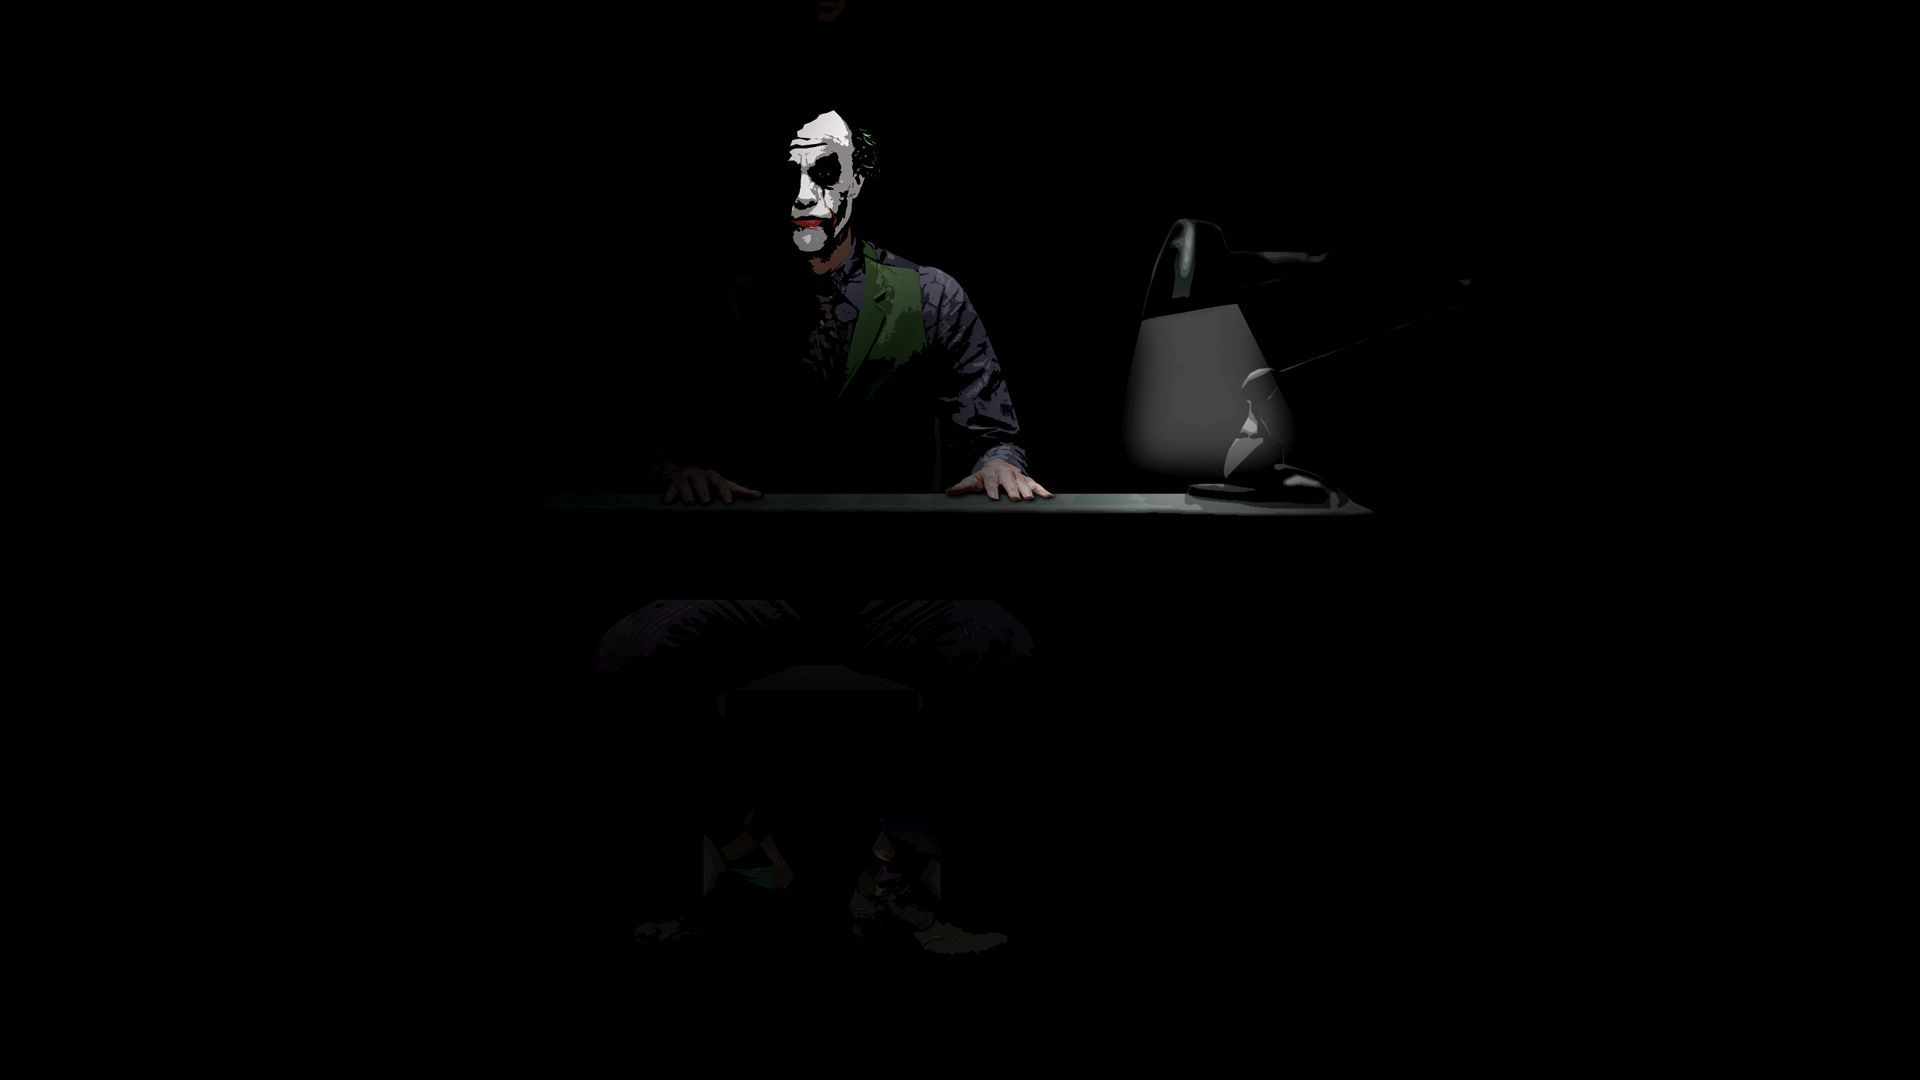 Dark Knight Joker Black And White Wallpaper Homecid